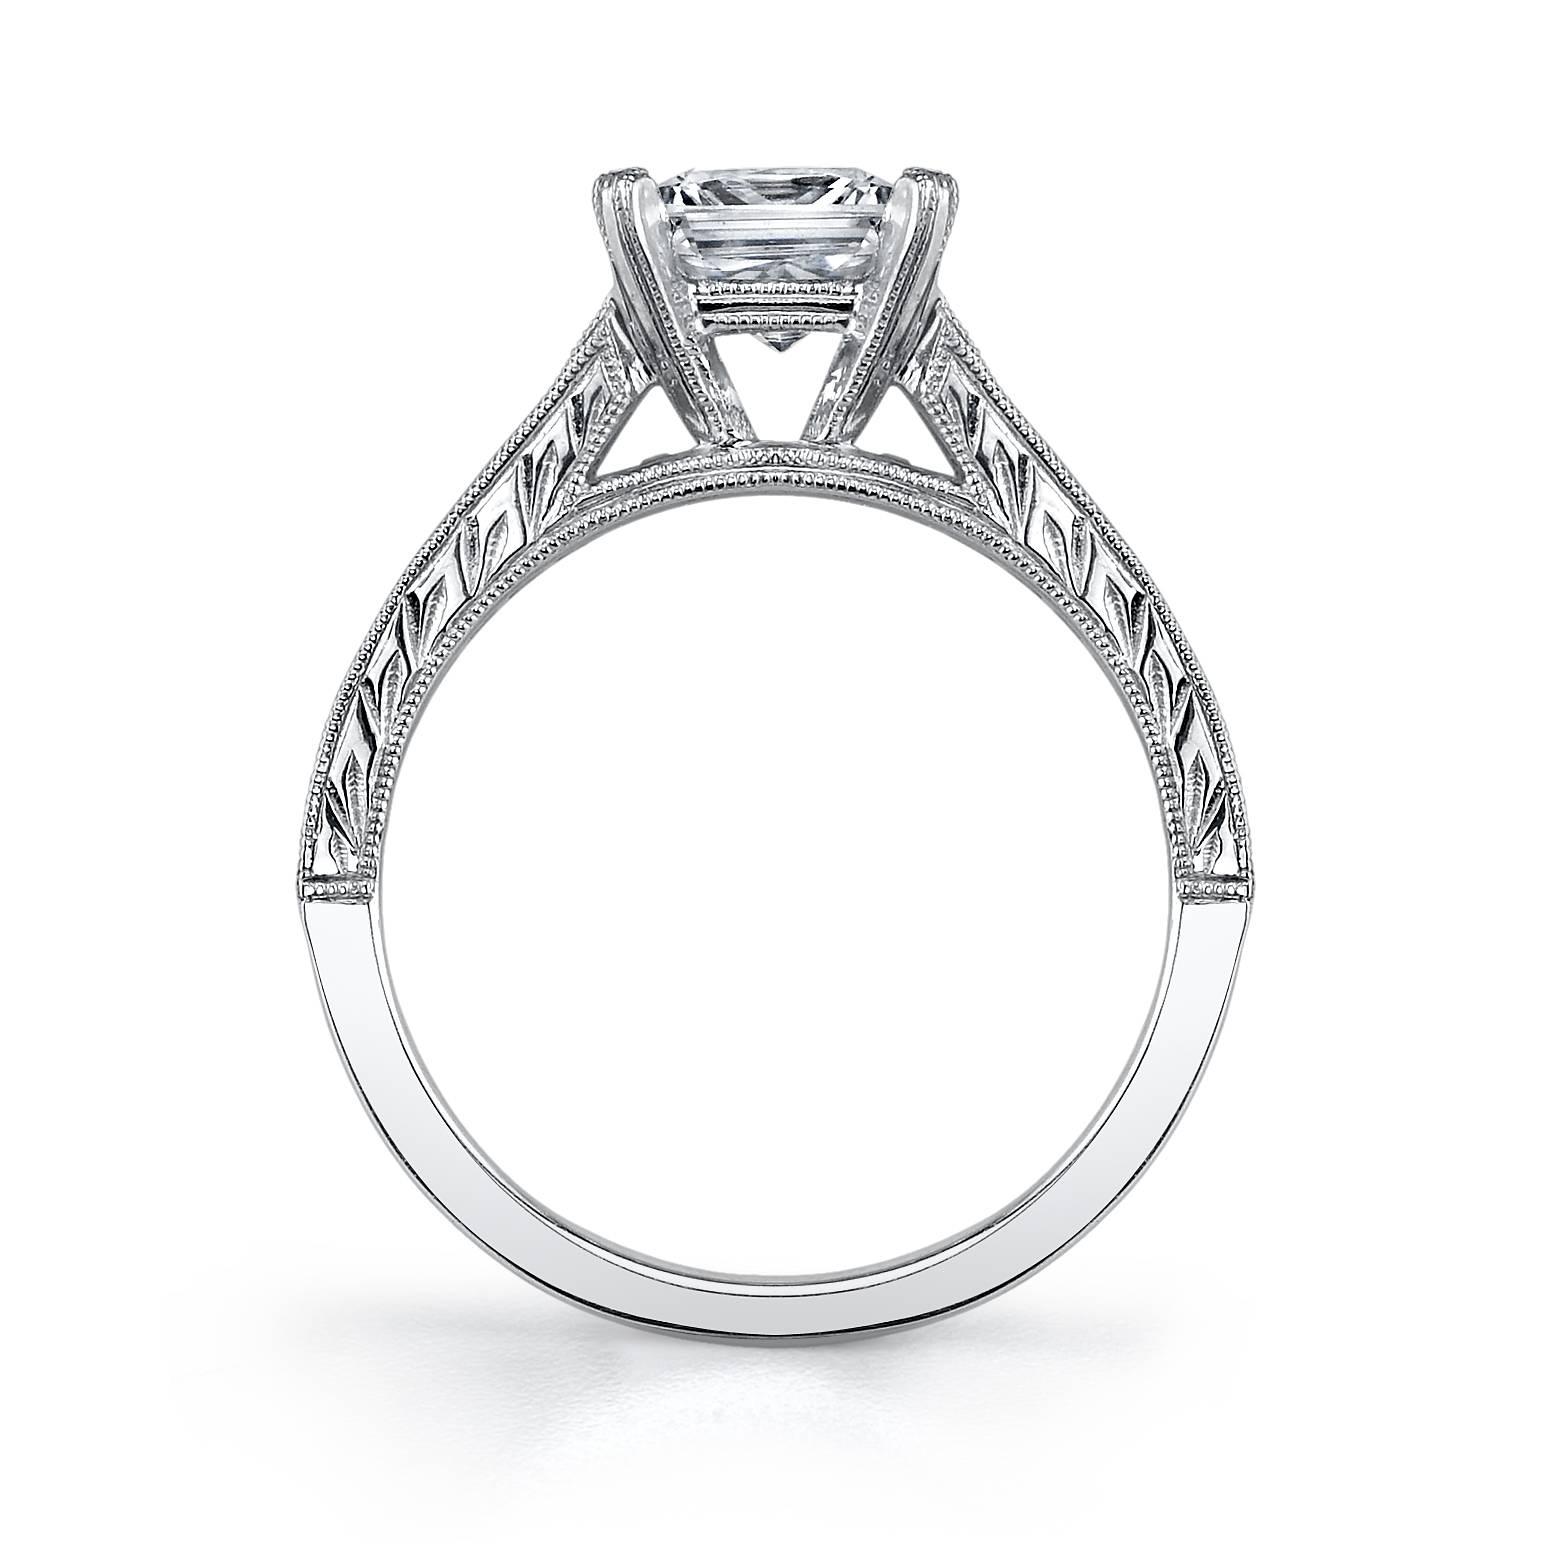 Charlize - Princess Cut Baquette Engagement Ring - S1051